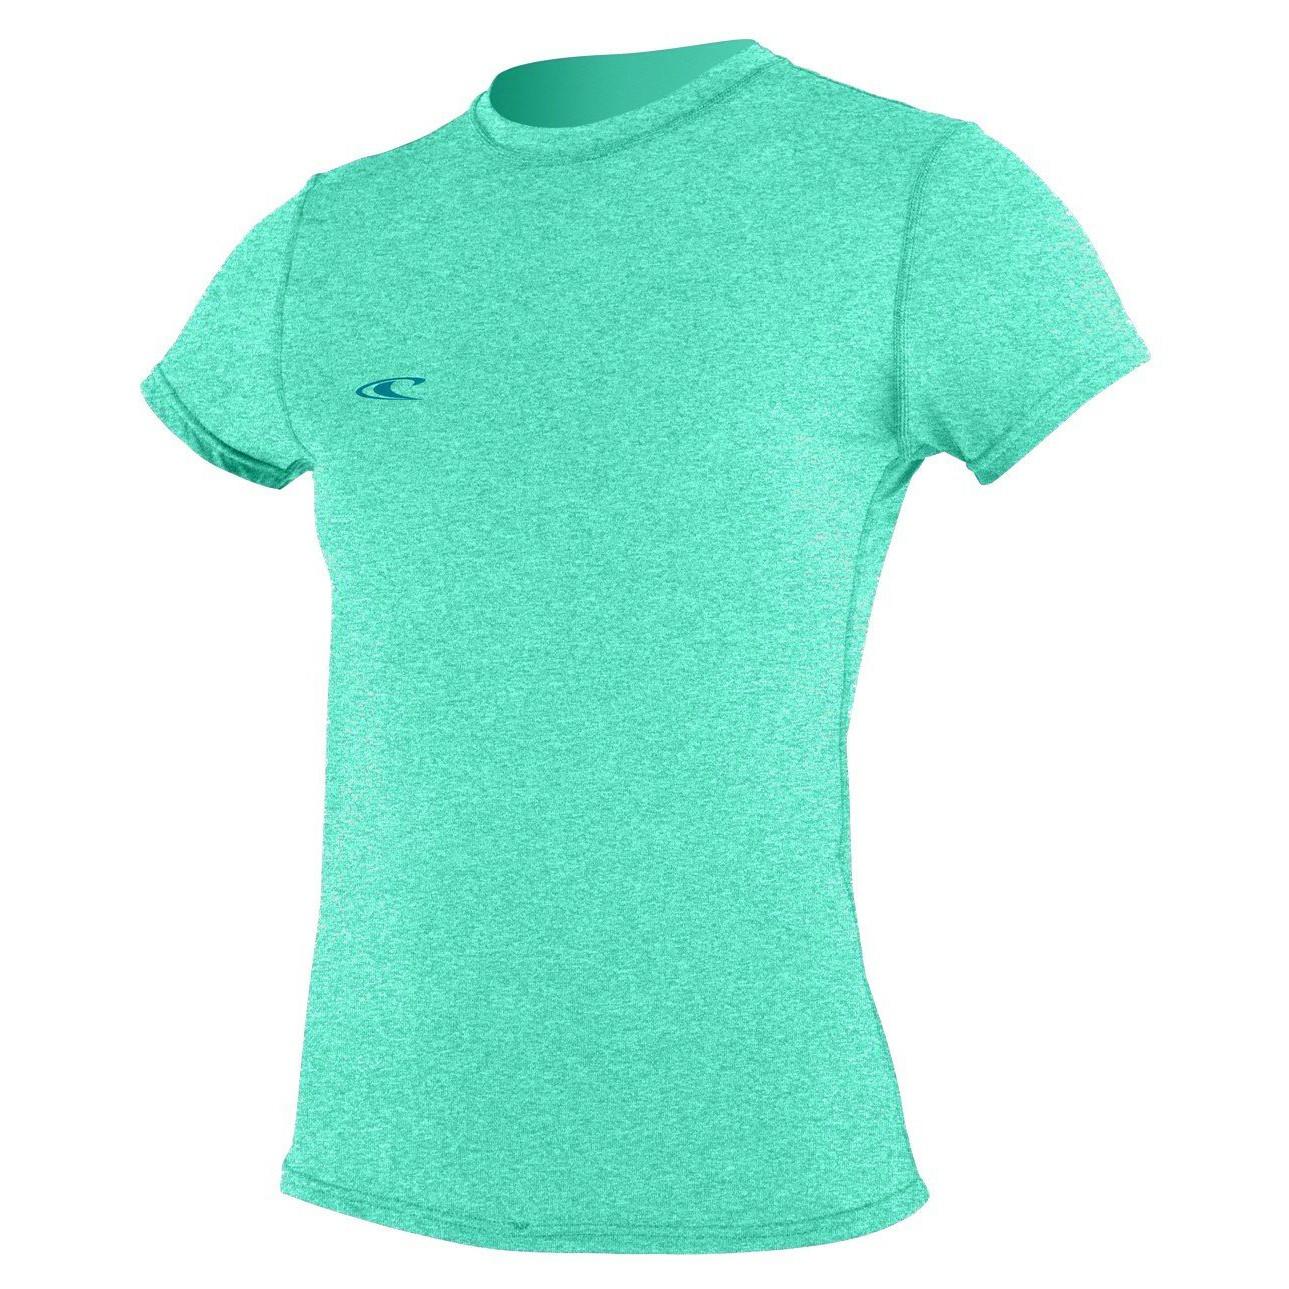 O'Neill  Hybrid 24-7 50+ UV Short-Sleeve Tee (Women's)